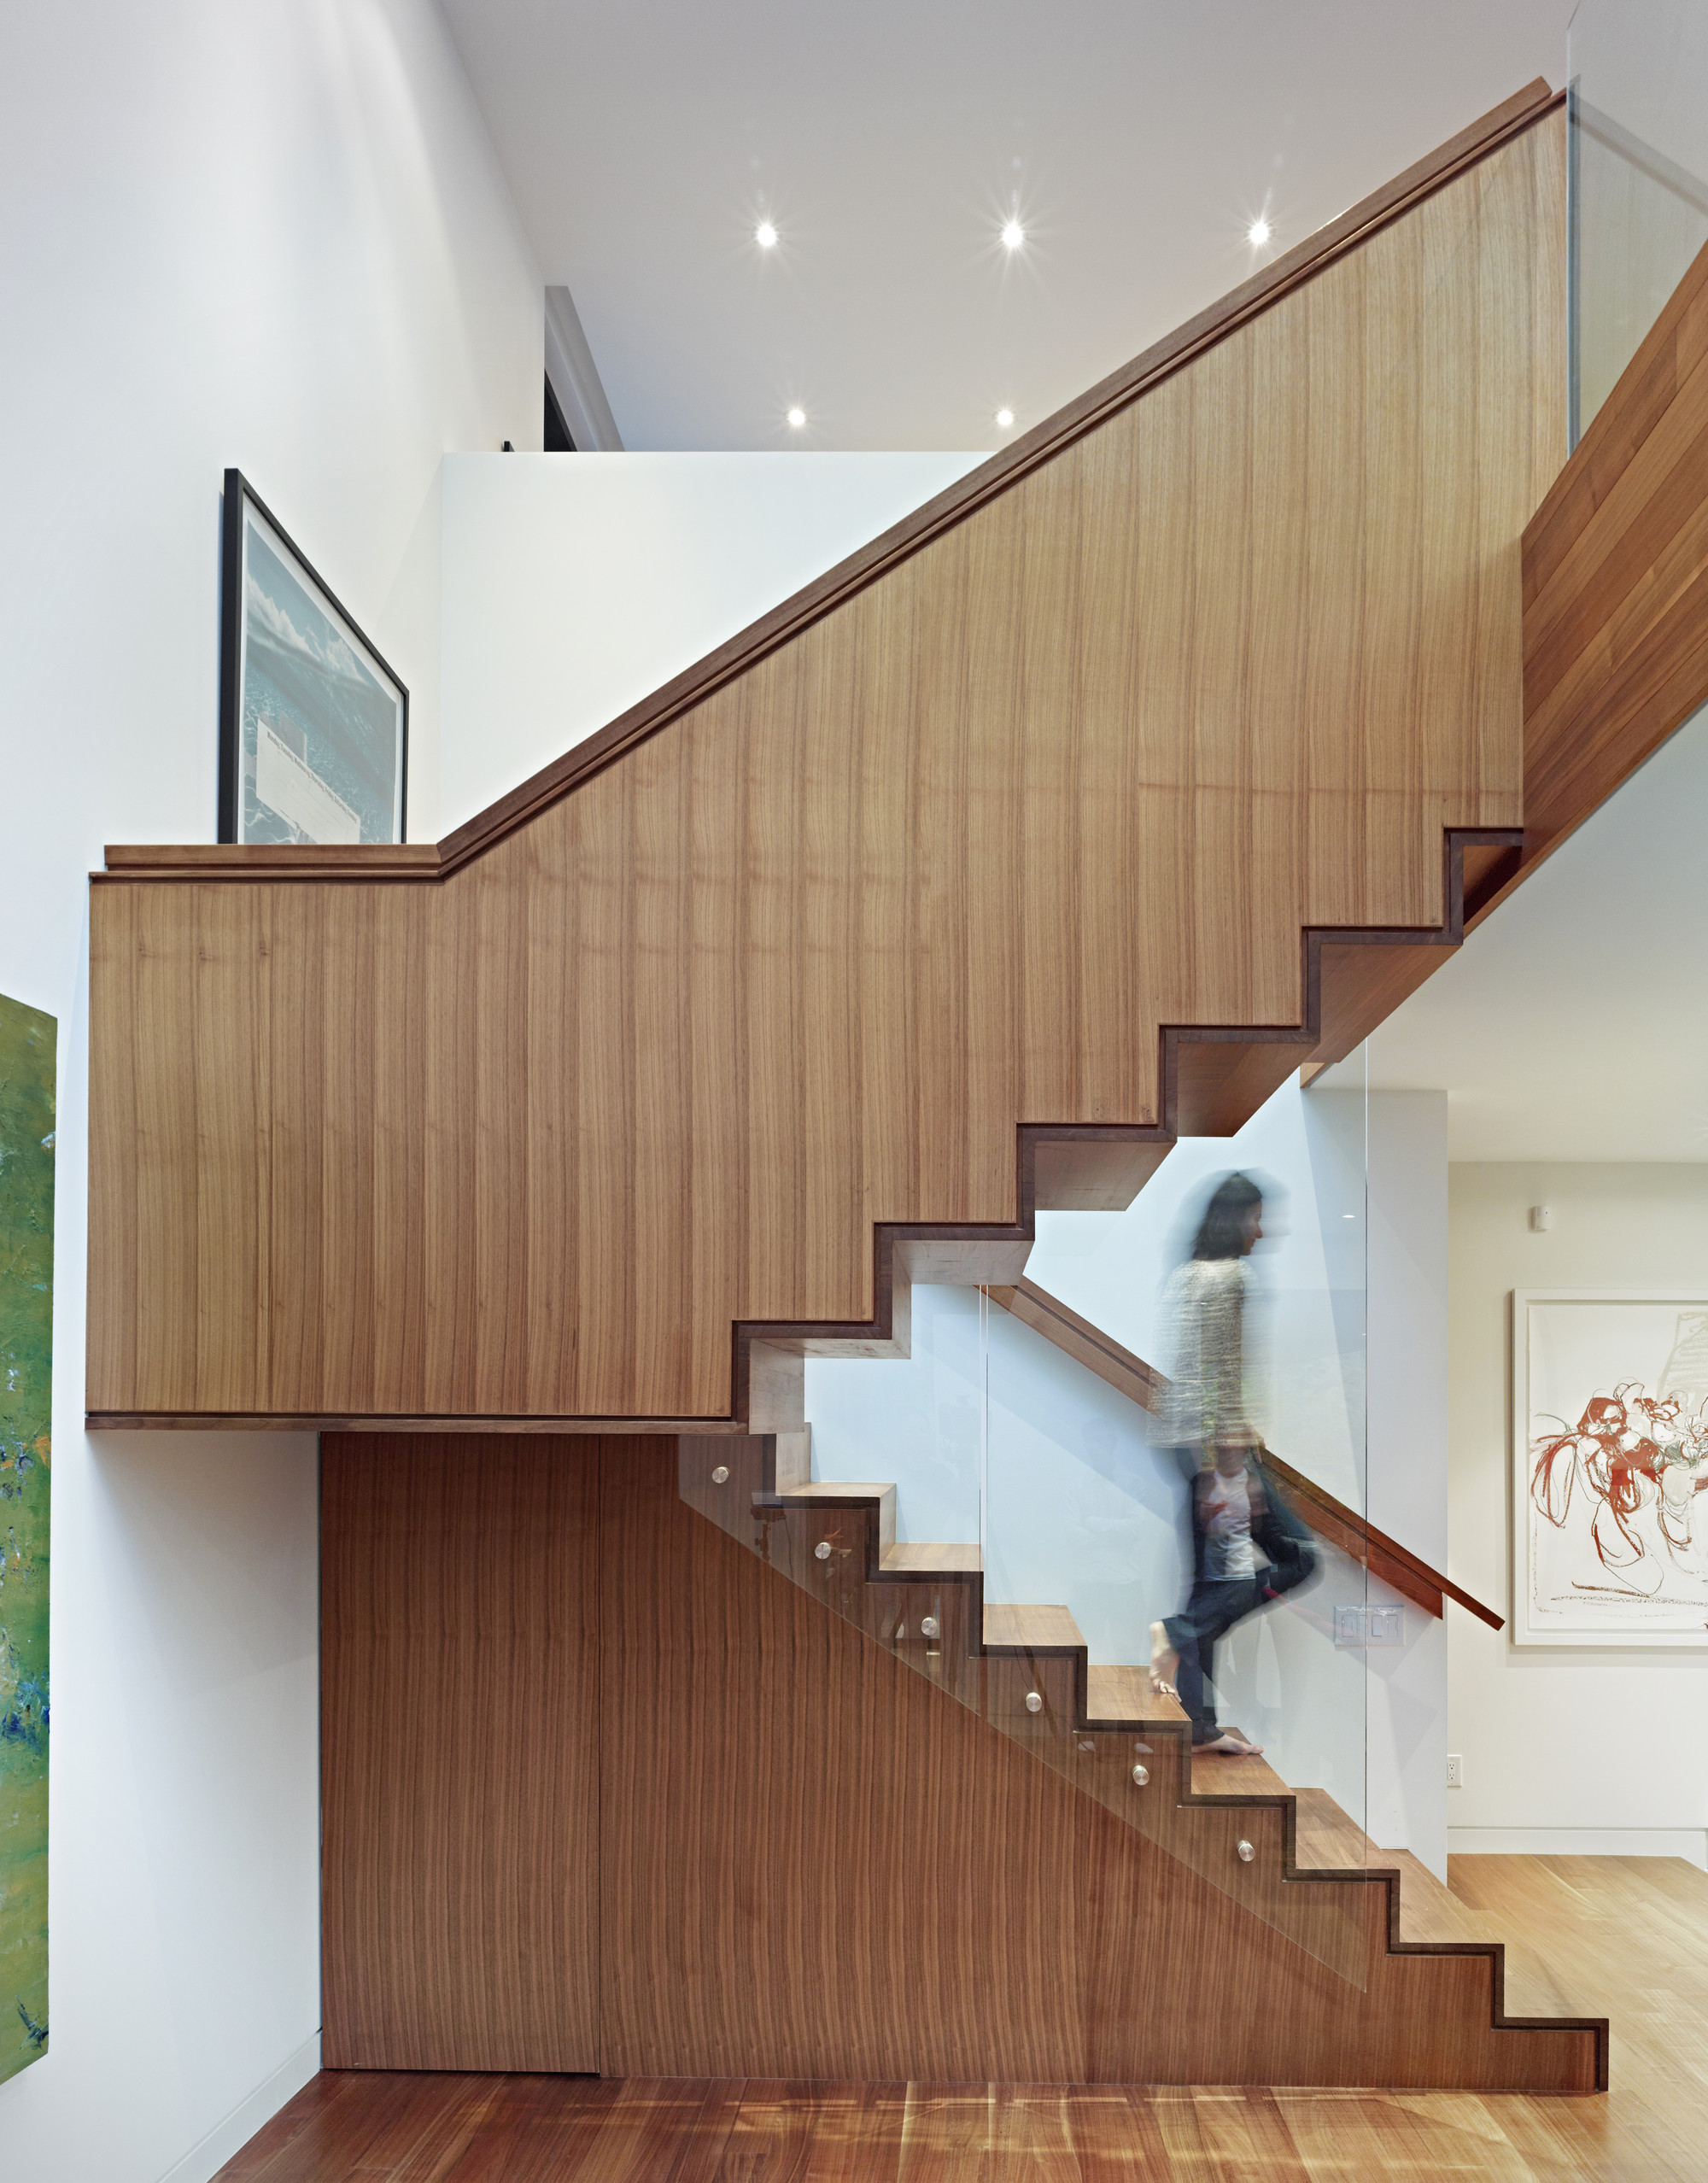 Cedarvale Ravine House Designed By Drew Mandel Architects